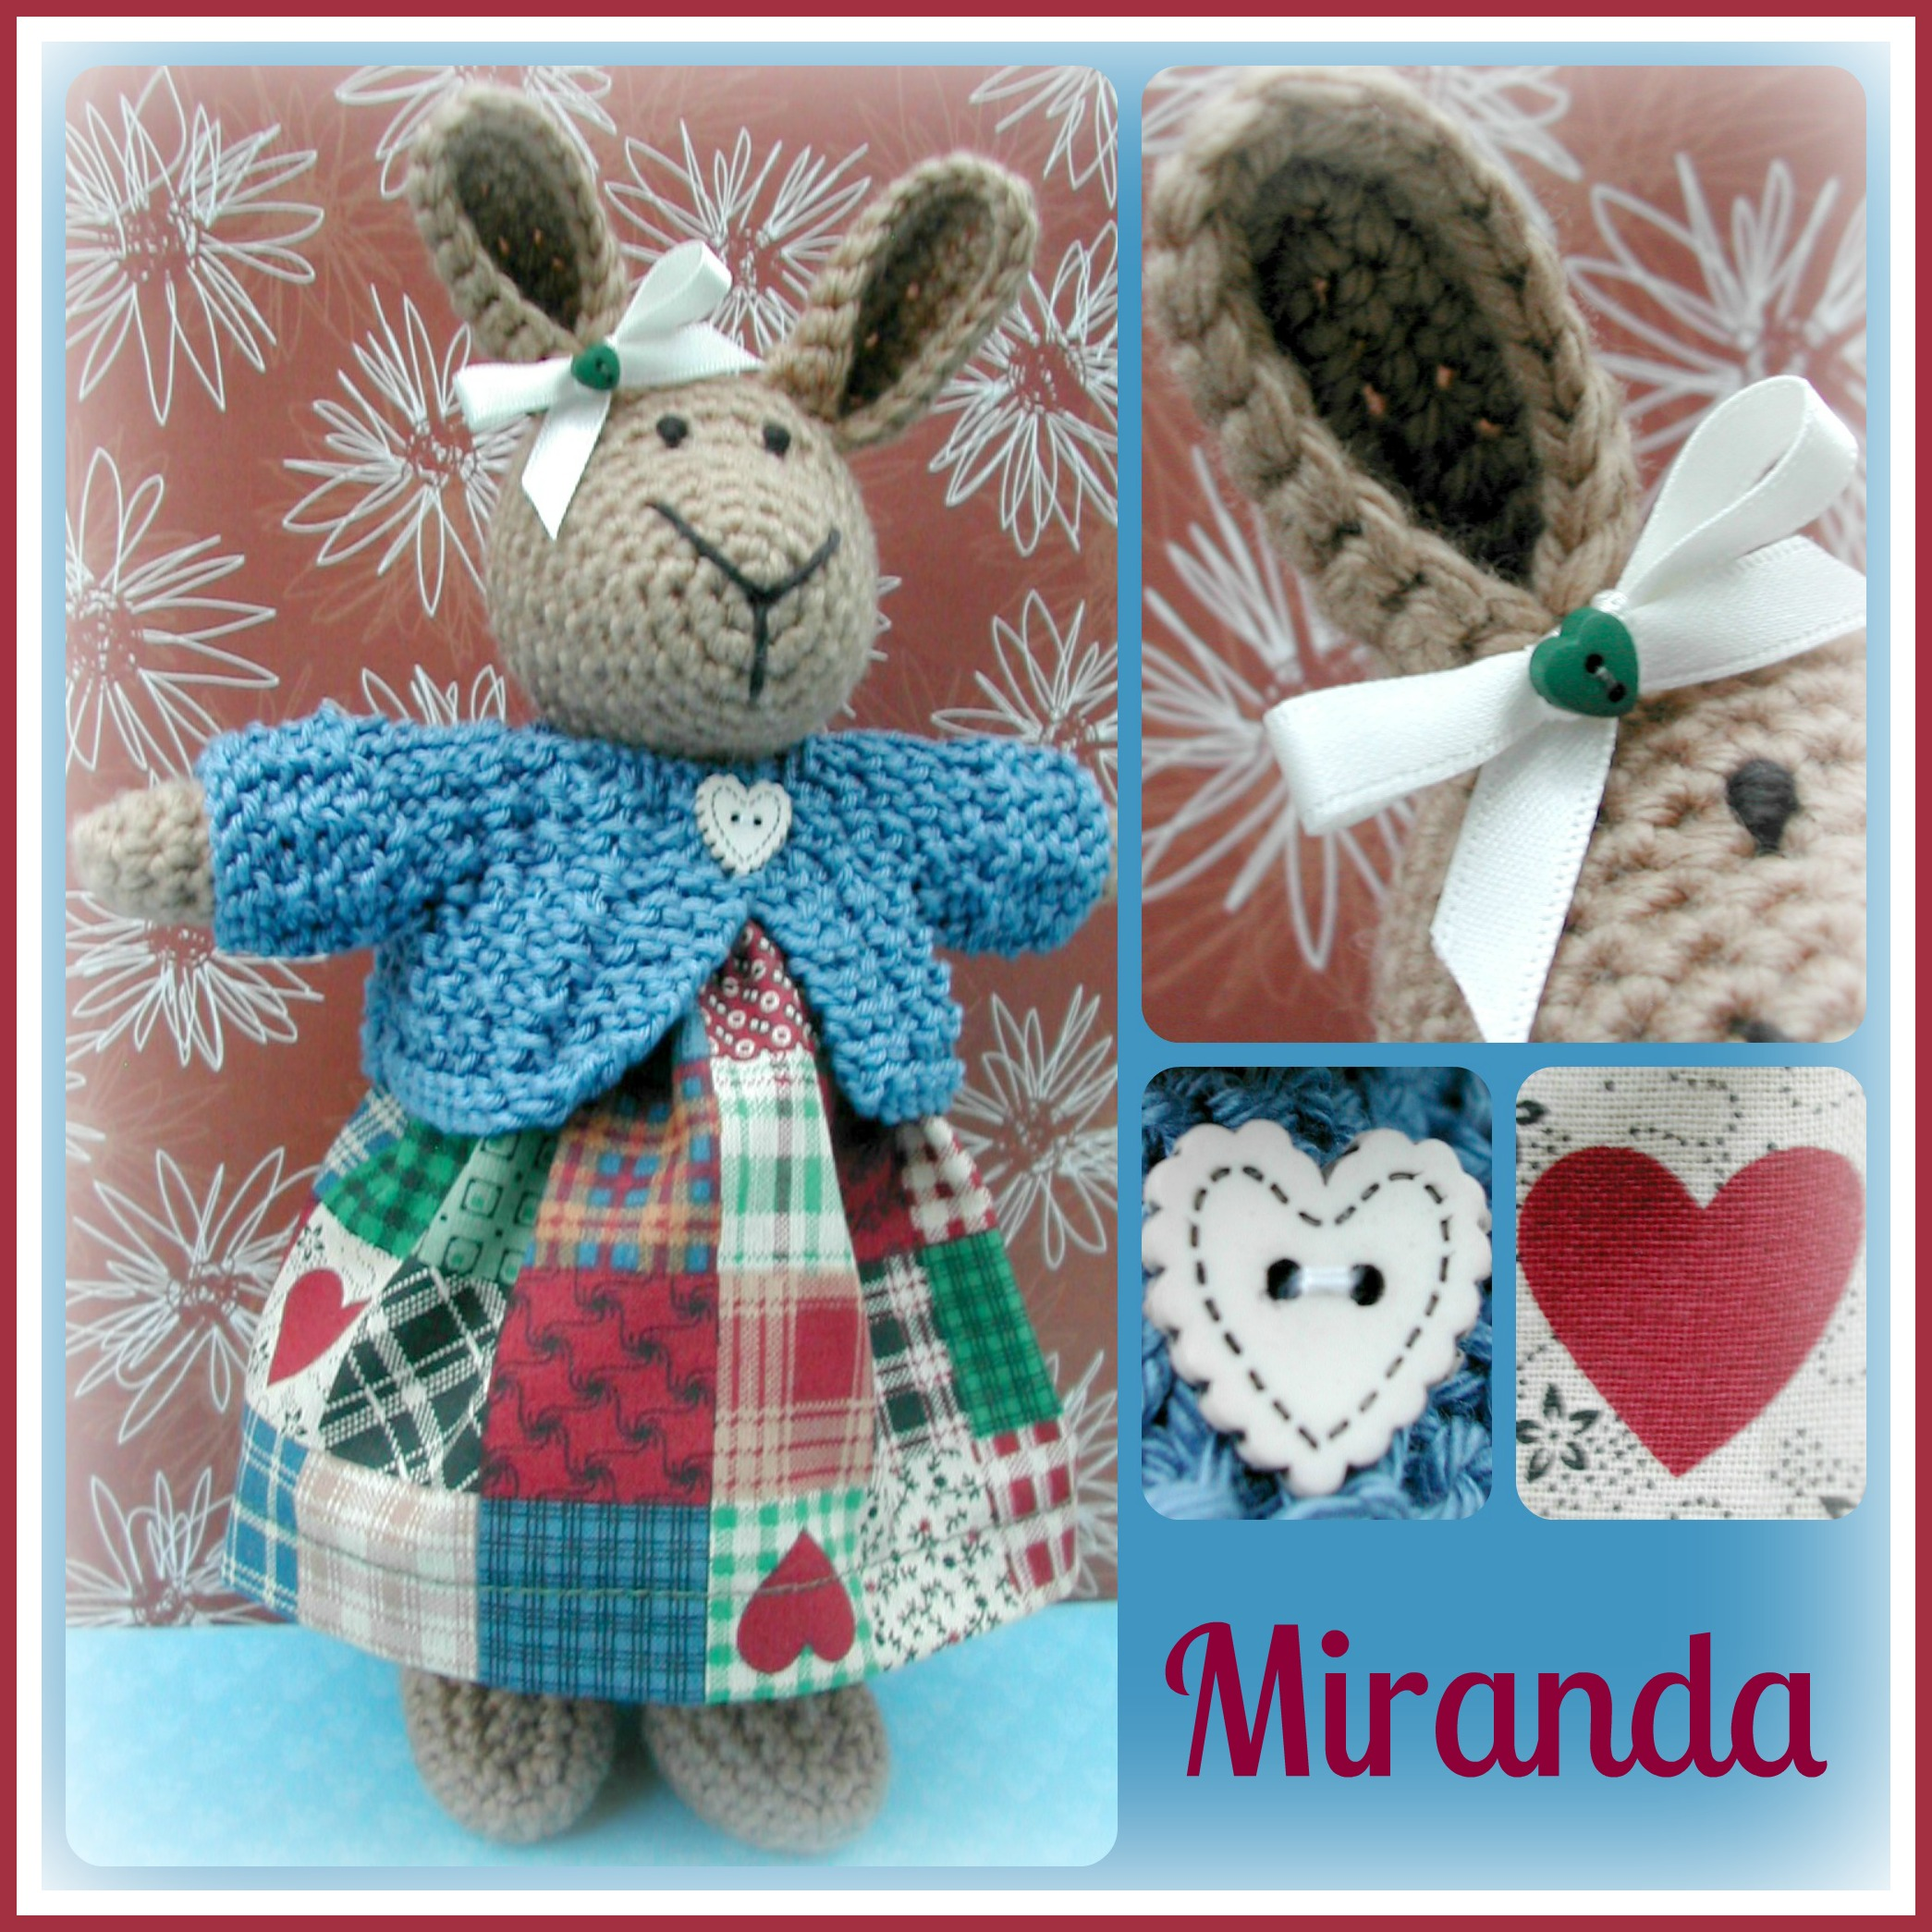 Miranda Collage